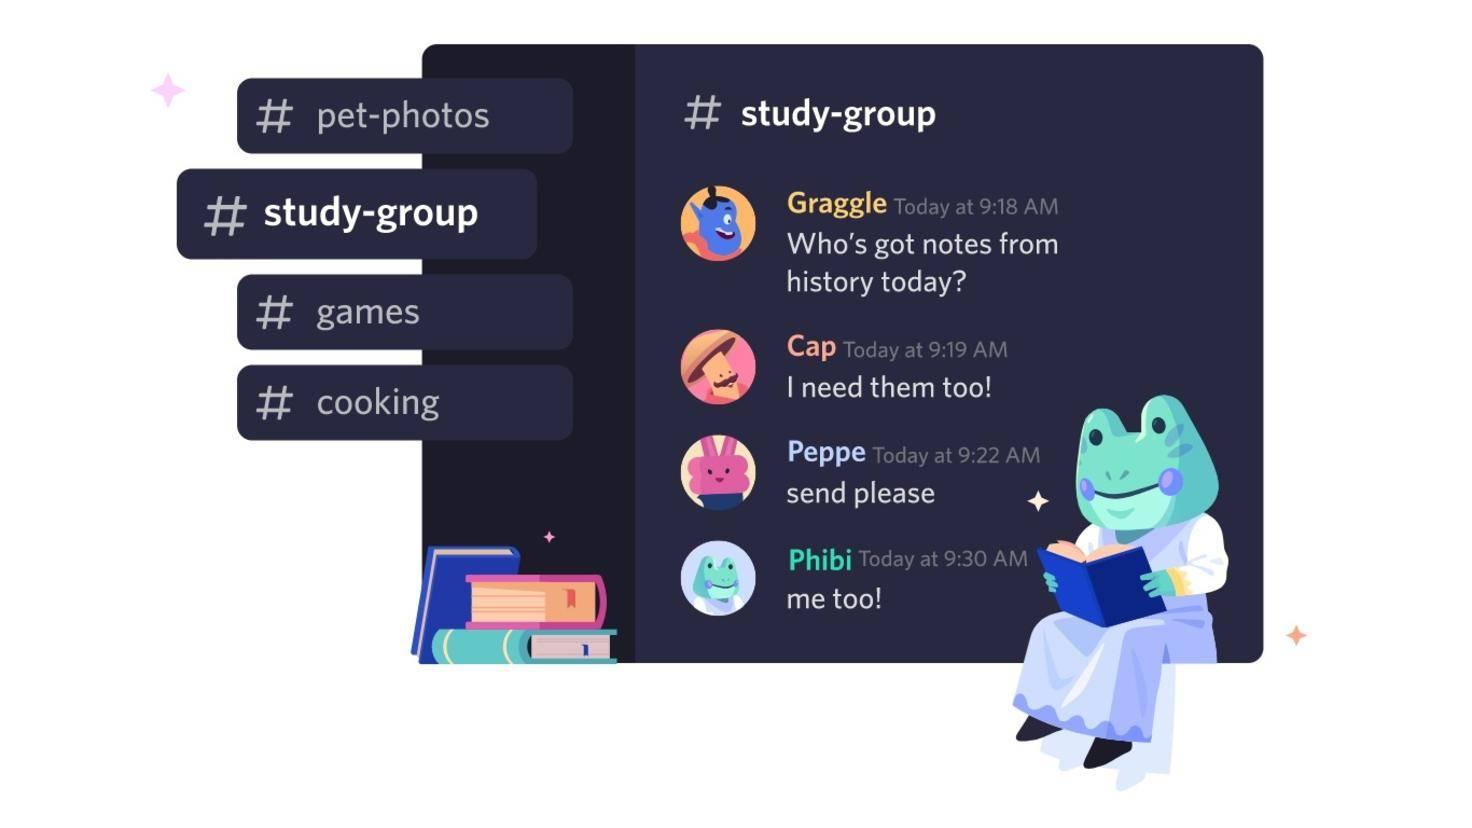 groupes de discussion discord